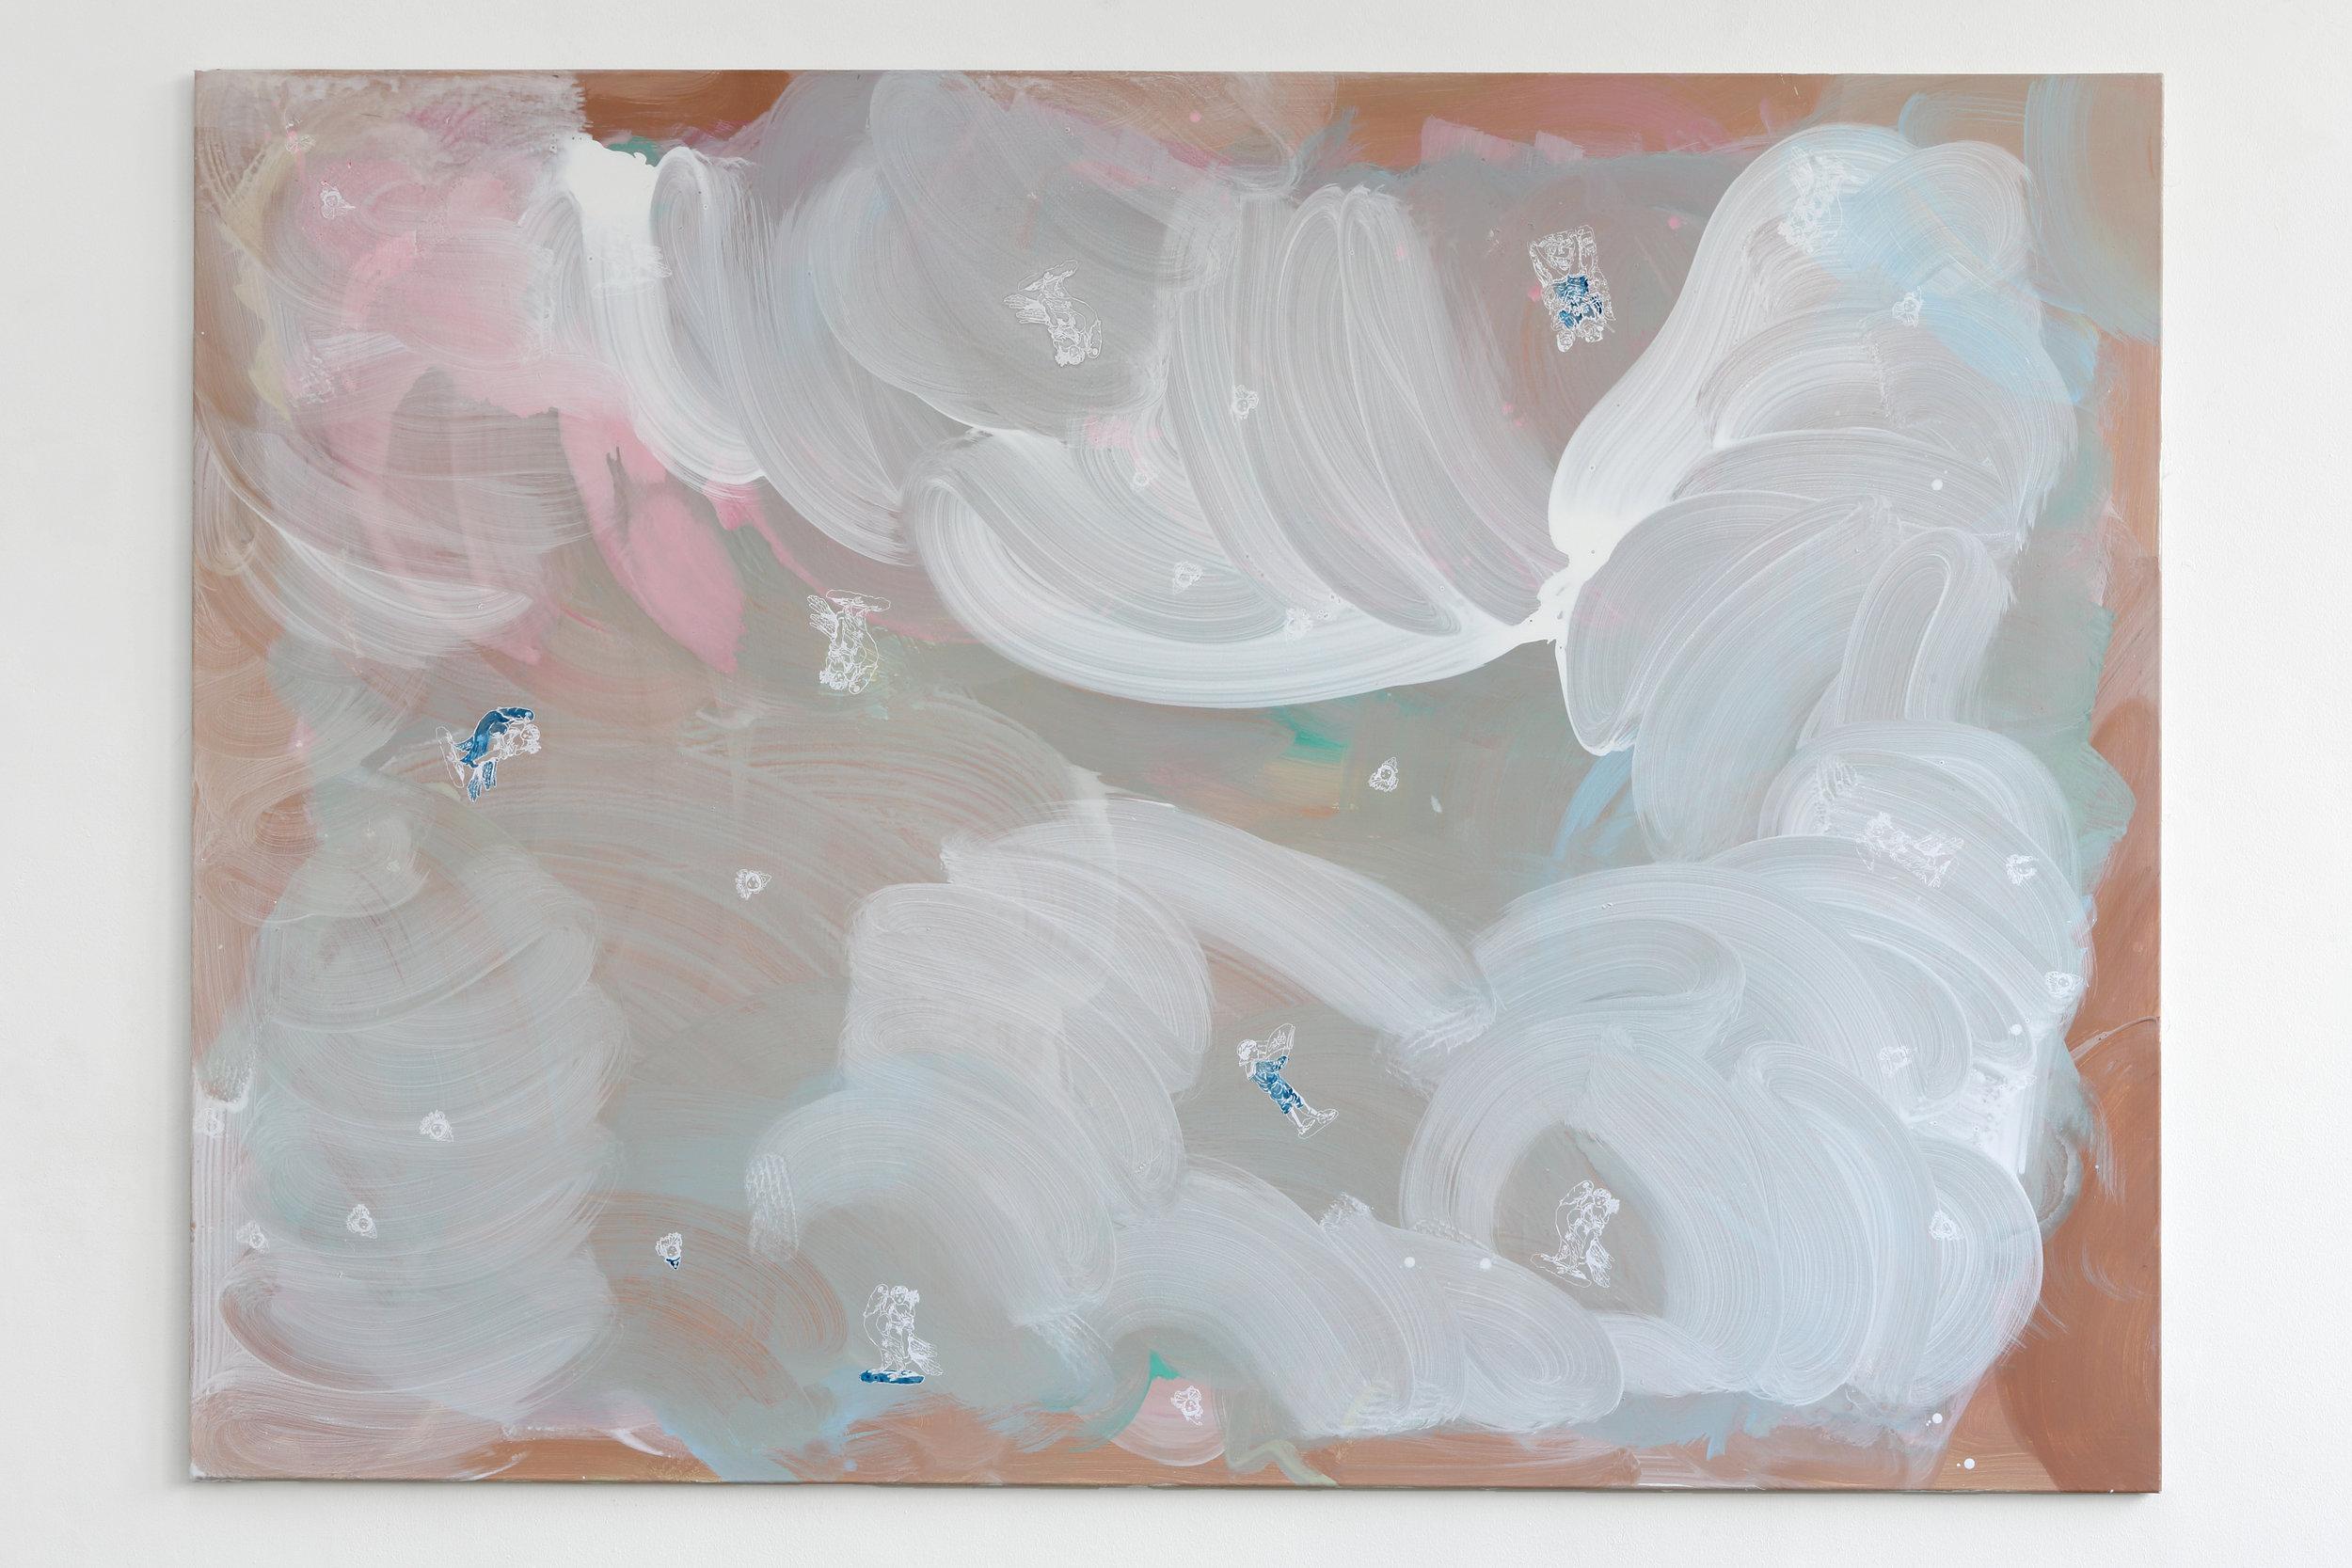 Cameleon Cult - Egg-tempera, primers and silkscreen print on canvas, 250 x 180 cm, 2018